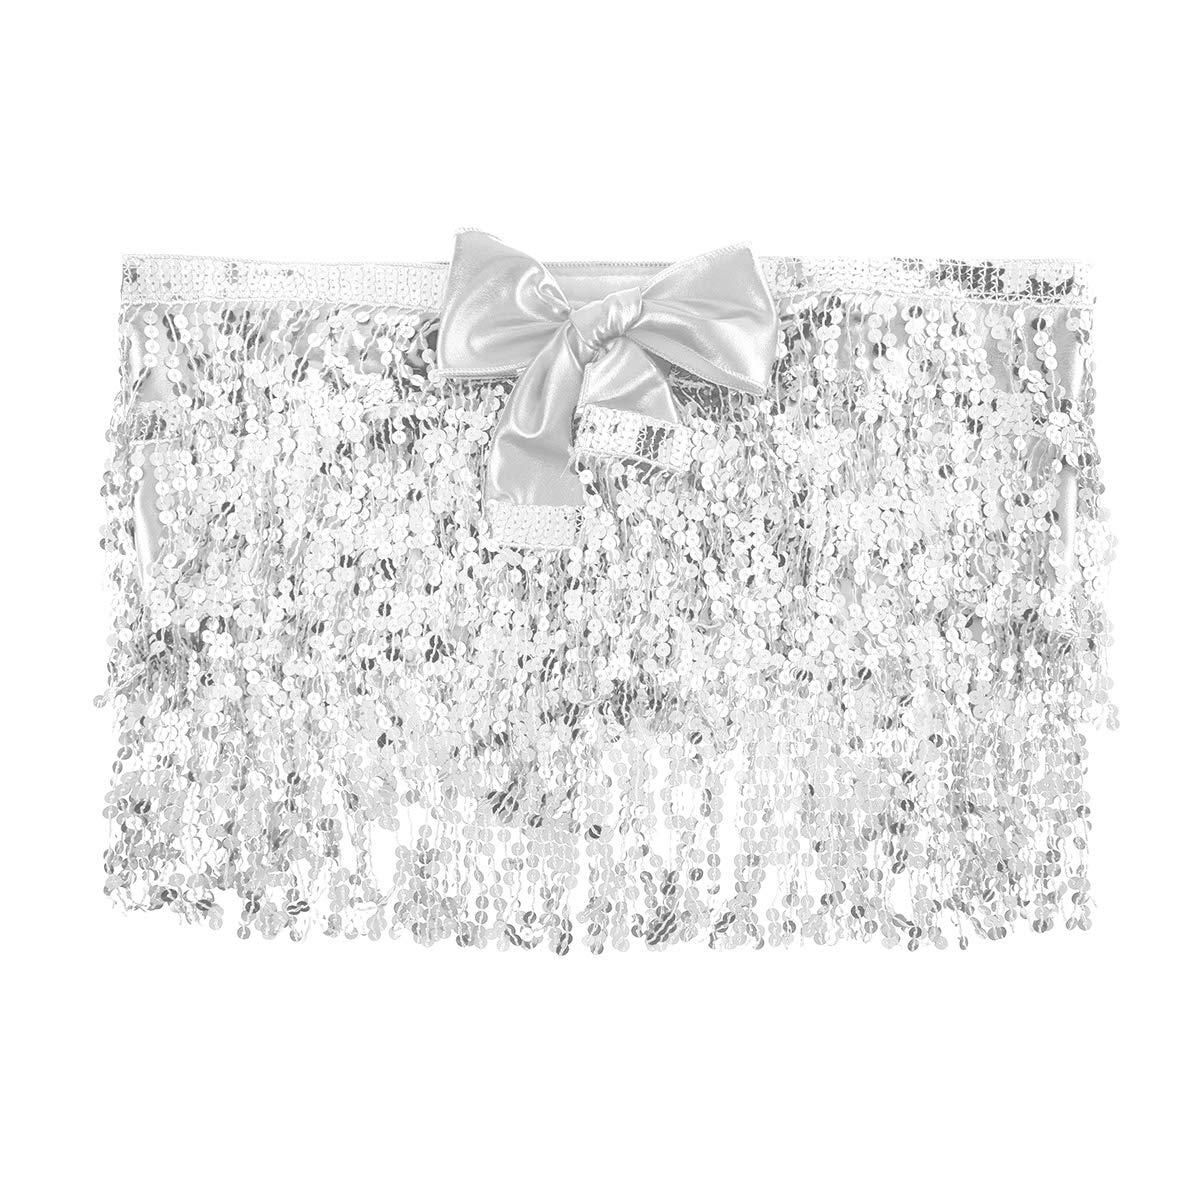 YiZYiF Femme Fille Jupe /à Paillettes Jupe de Danse Jupe de Orientale Frange Jupe de Ballet Latin Jazz Jupe Cancan Ballroom Rumba Salsa Samba Tango Tutu Jupe Soir/ée Bal